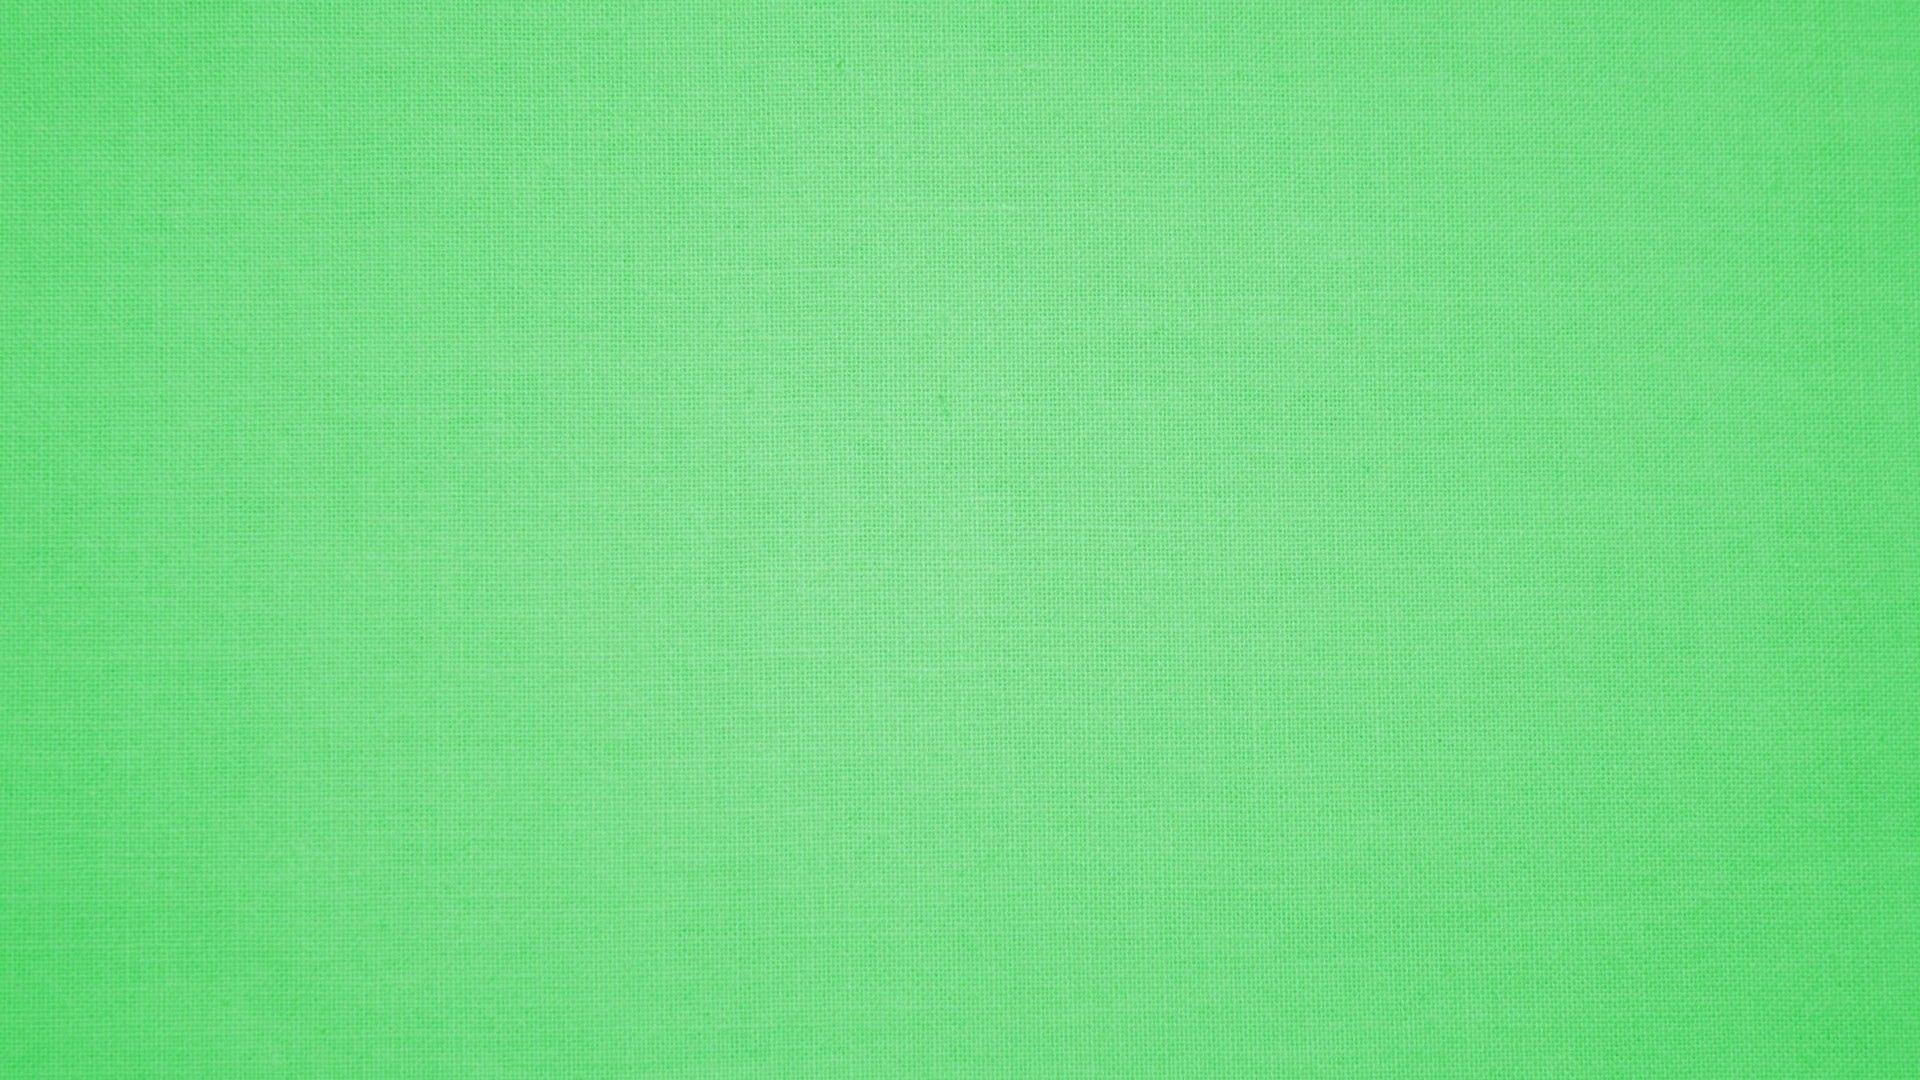 Mint Green a wallpaper